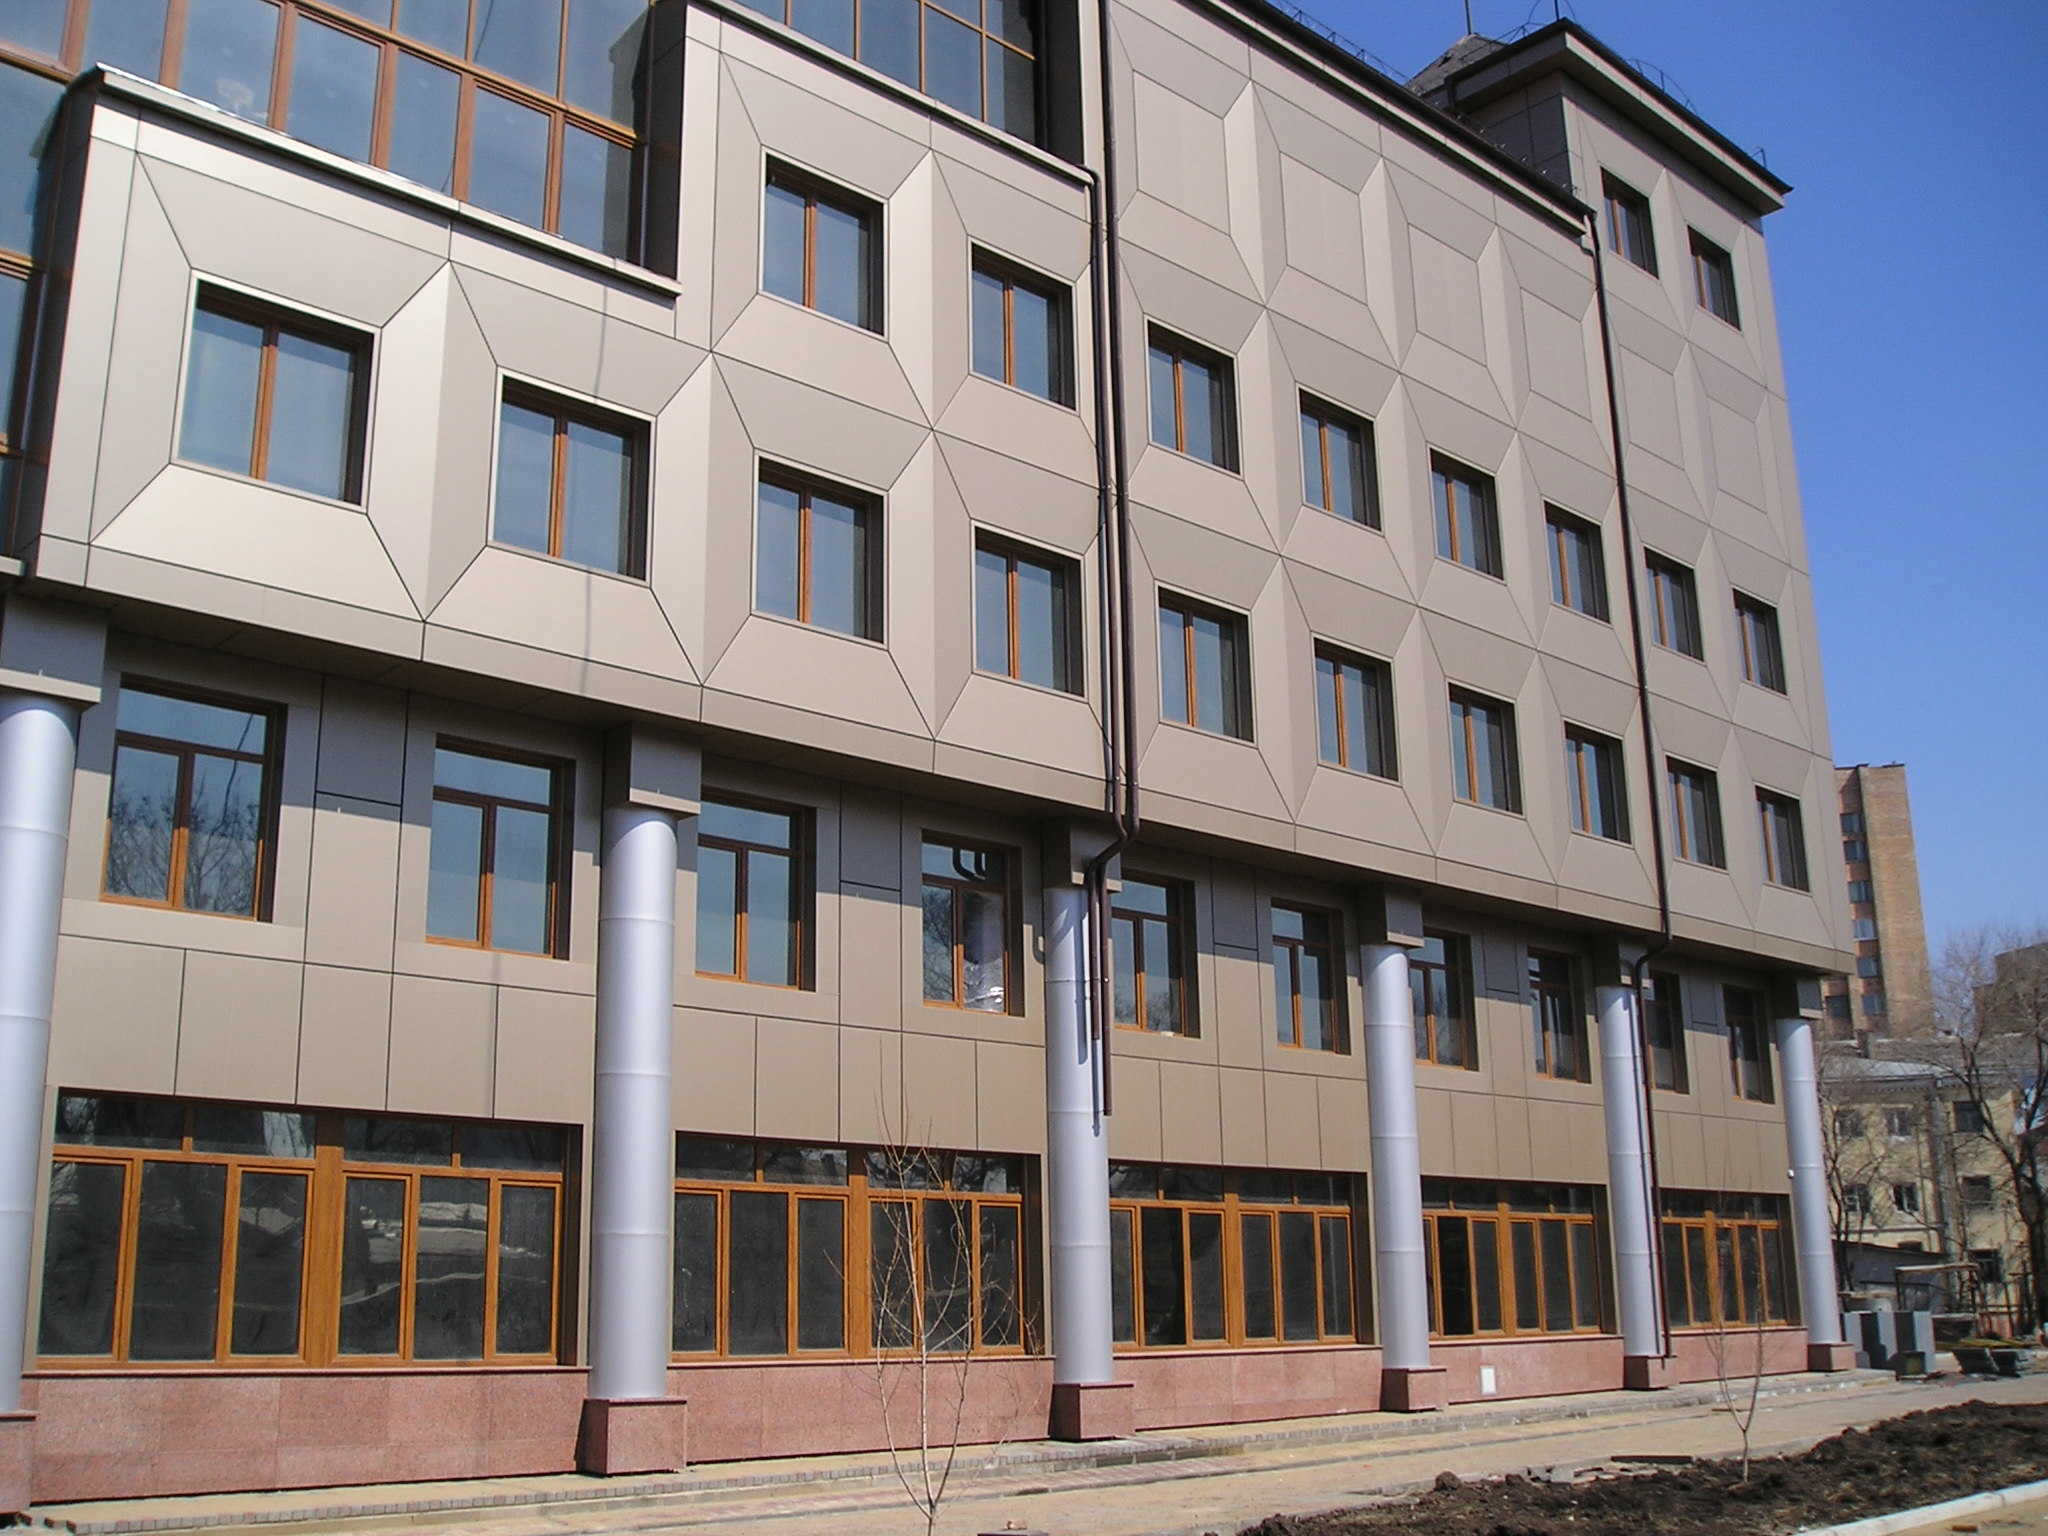 Металлические панели для фасада